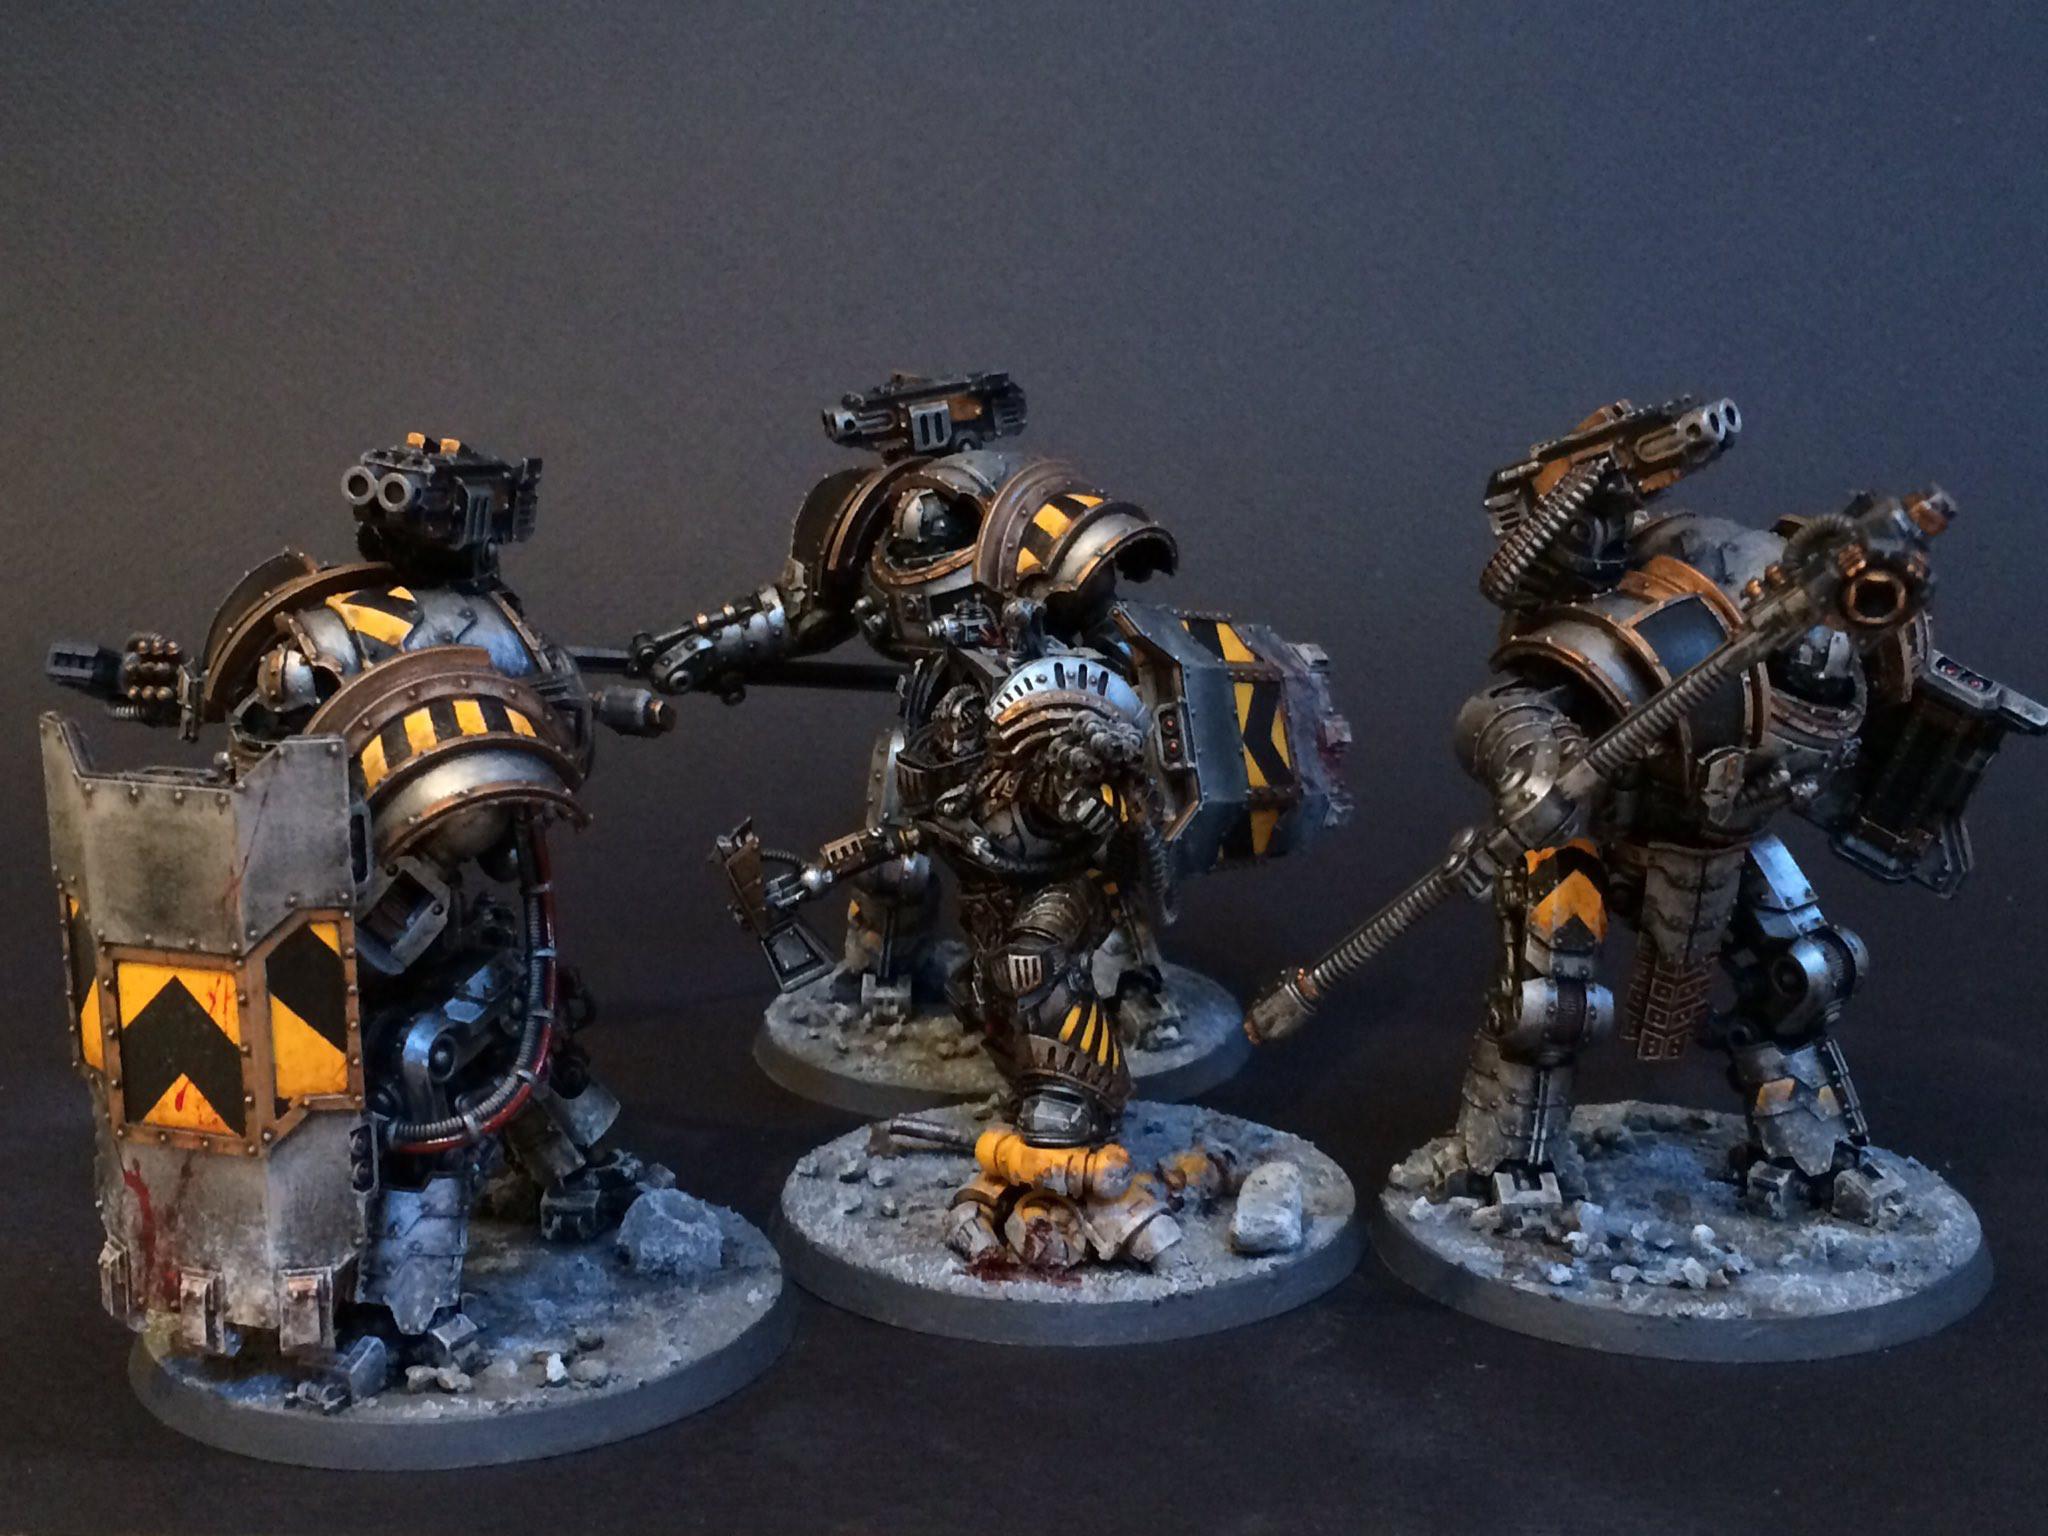 Warhammer Models, Space Wolves, Warhammer 40000, Marines, Tabletop,  Warriors, Iron, Miniatures